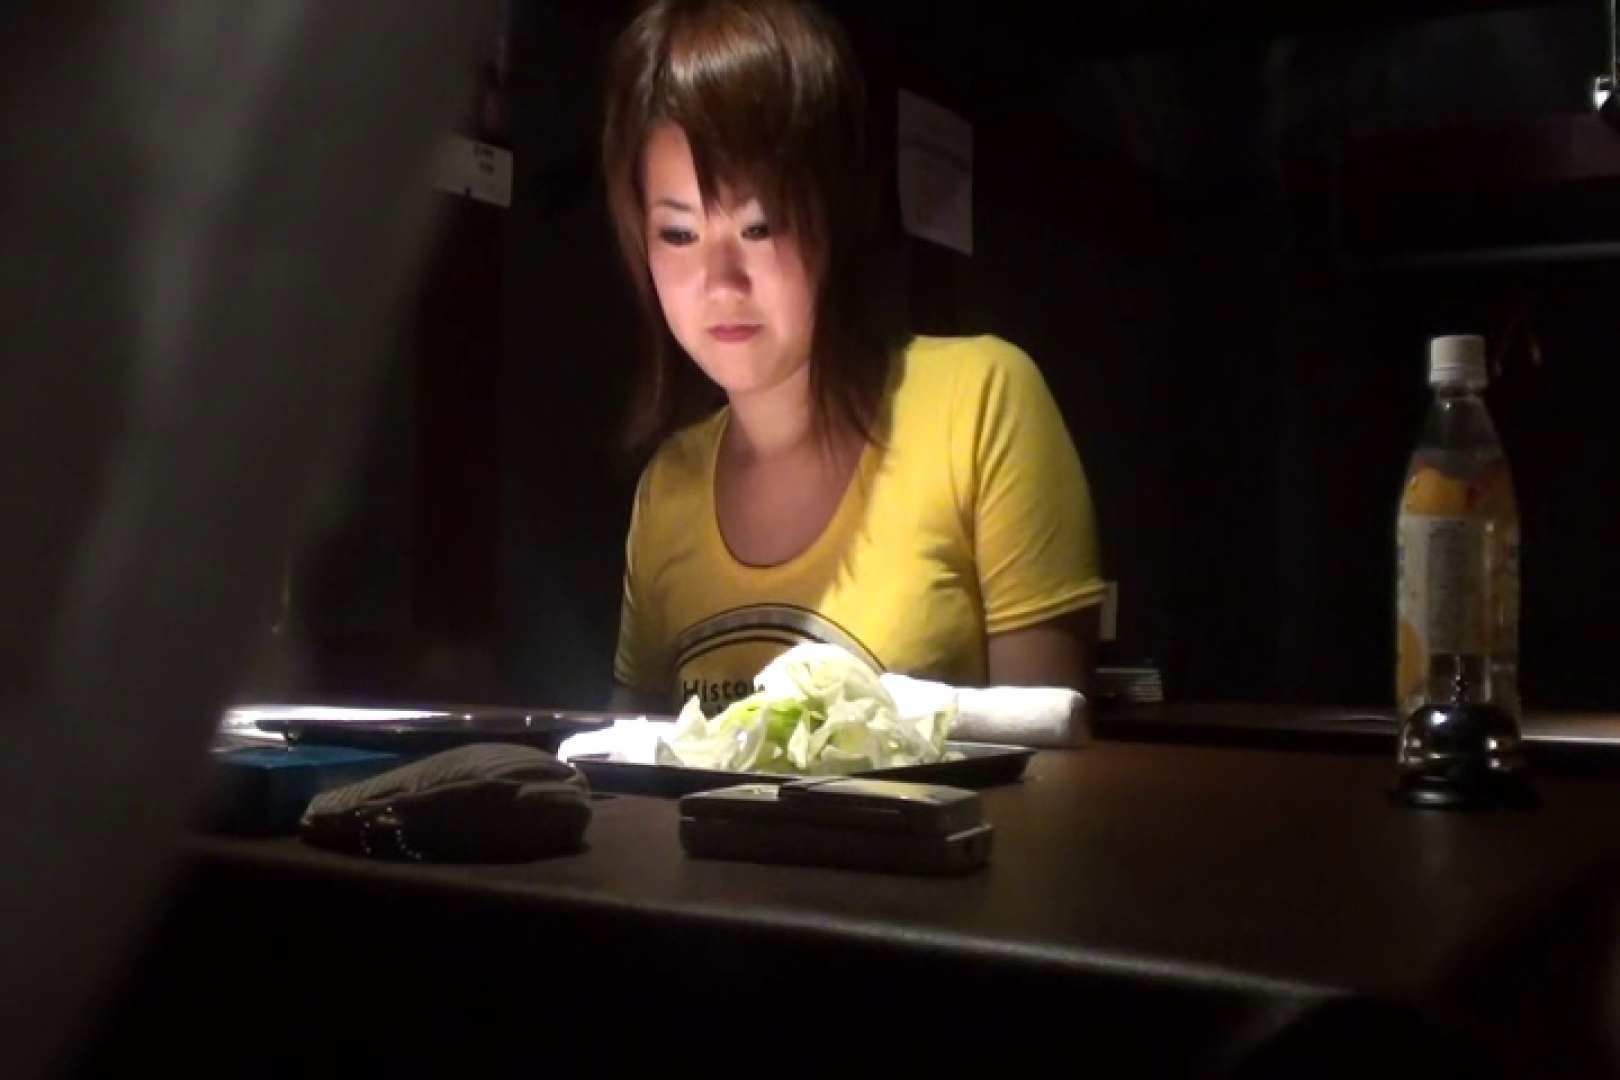 福岡援交 前編 無修正マンコ 戯れ無修正画像 58連発 23